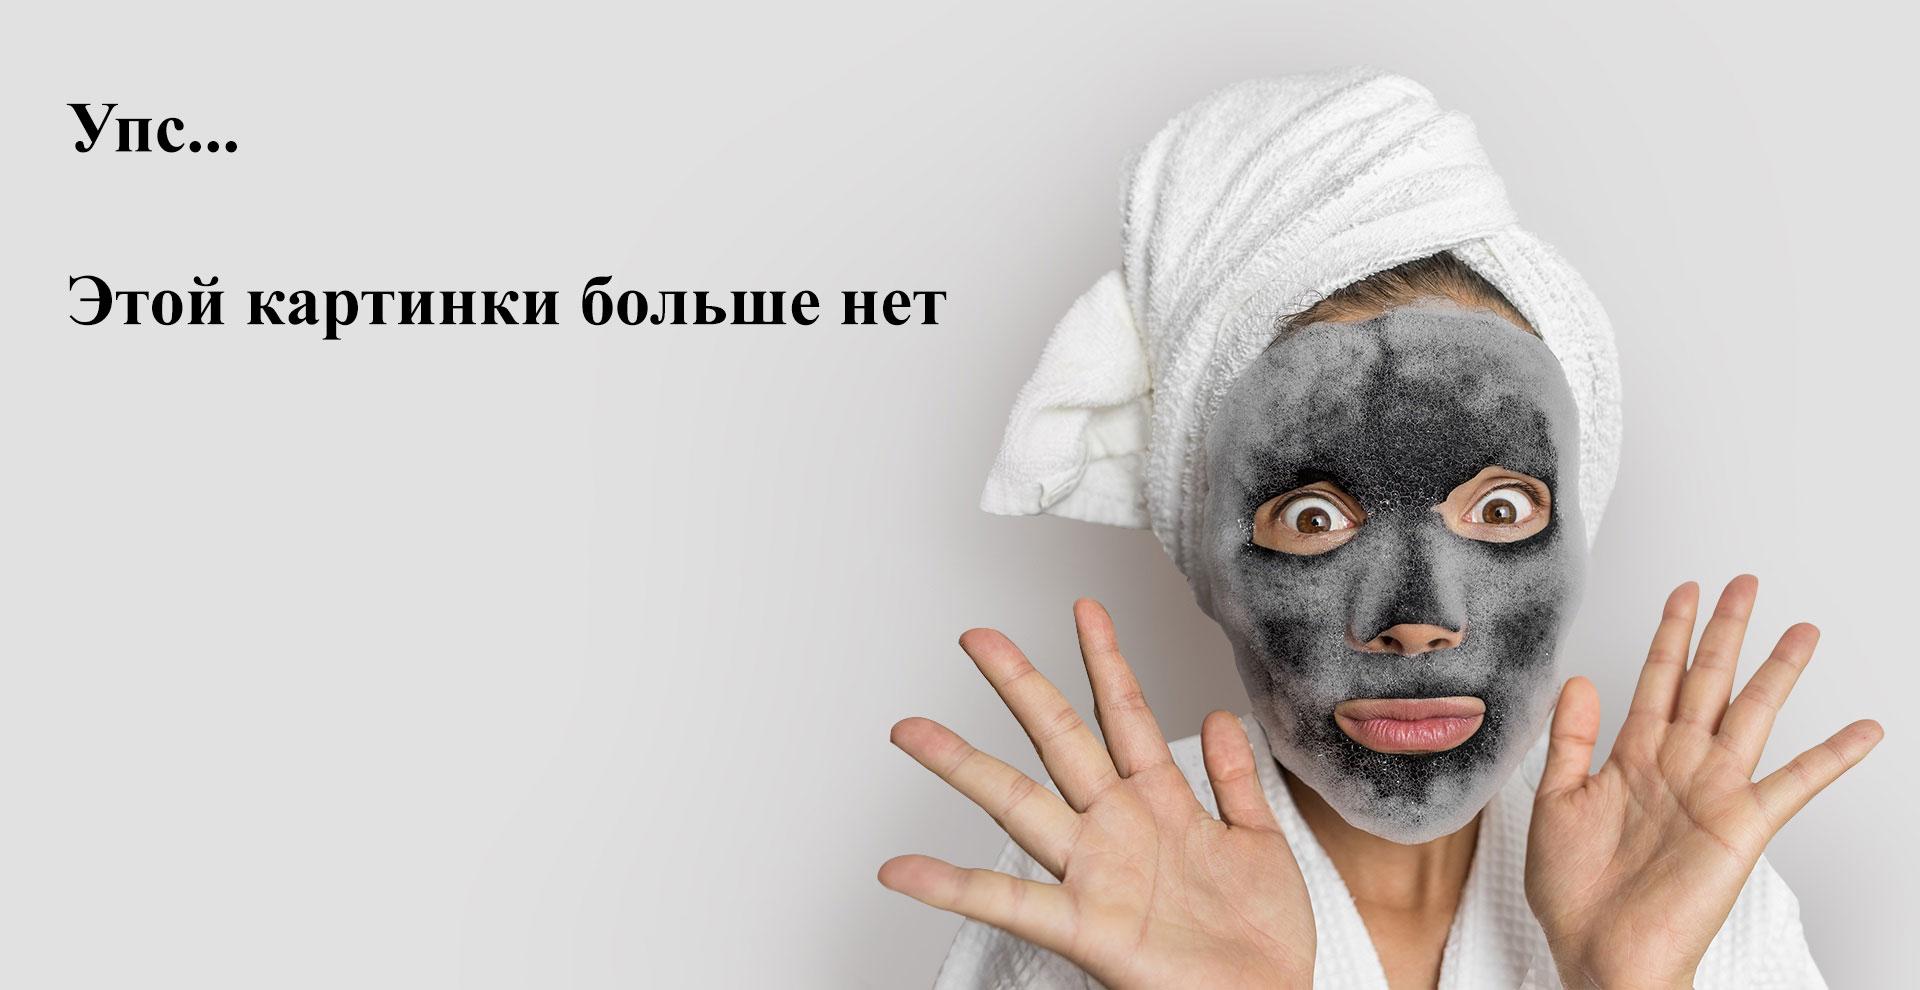 Selective Professional, Шампунь для сухих волос, увлажняющий, 250 мл